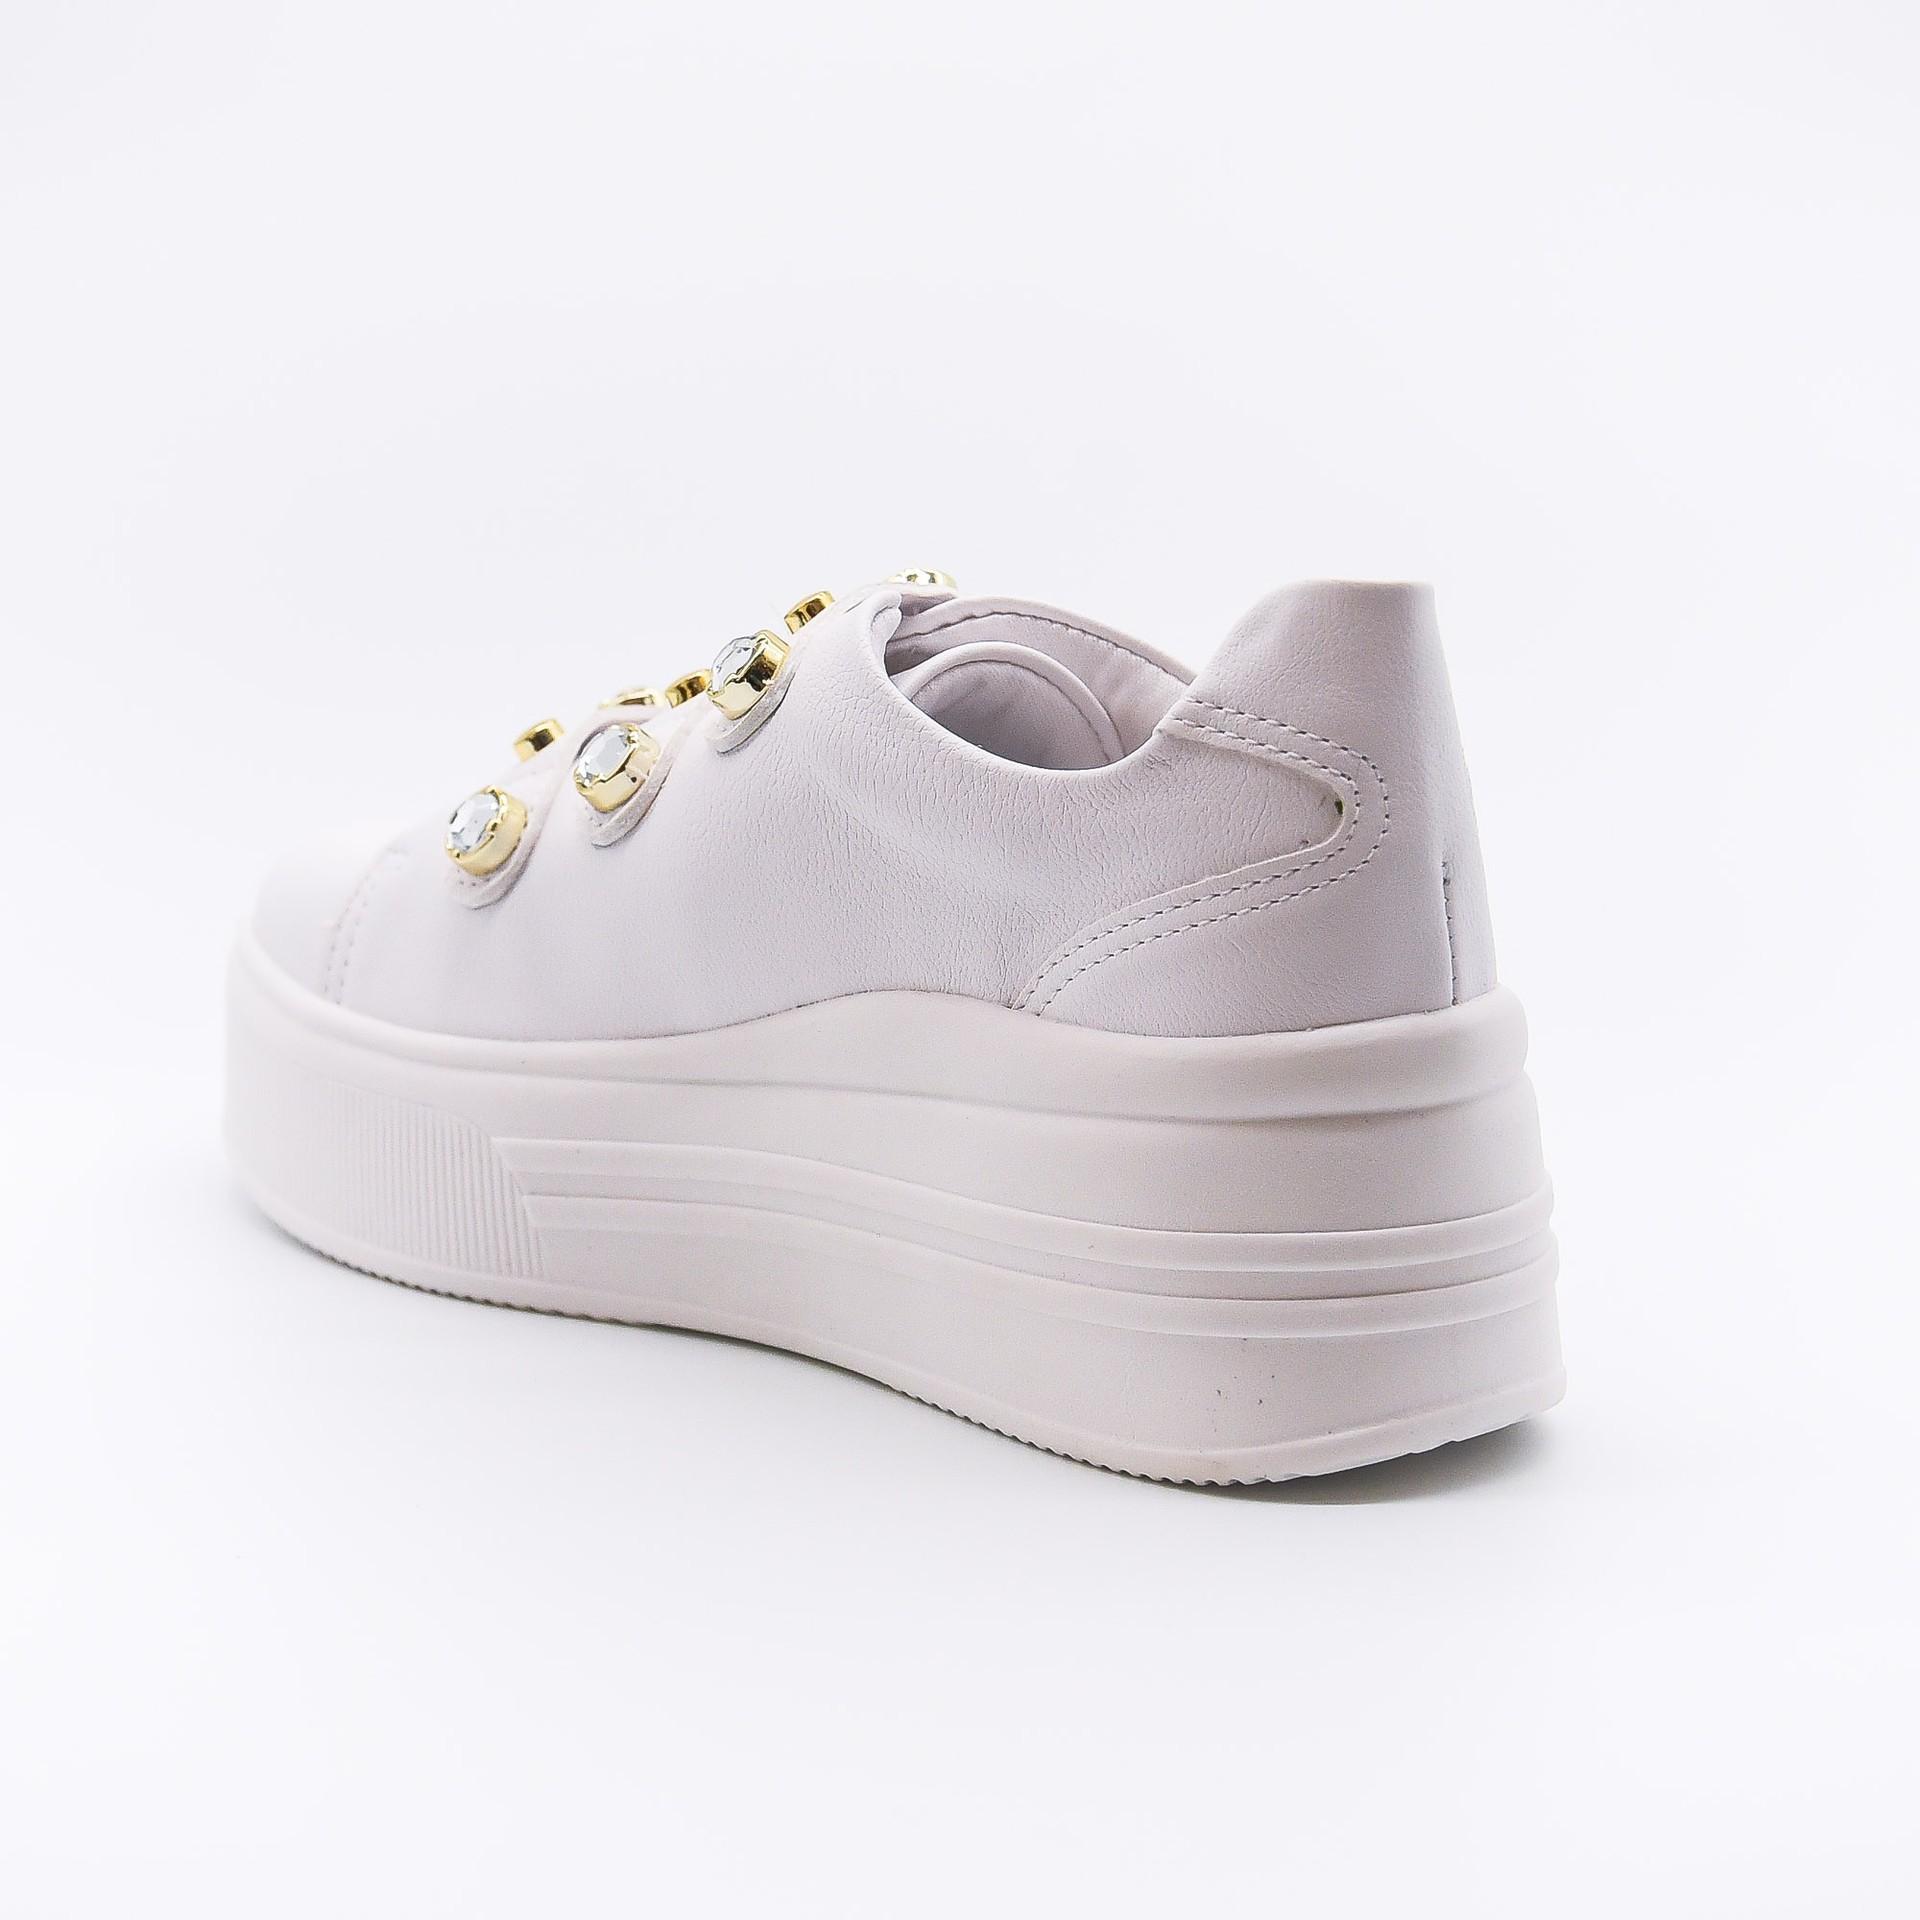 Tênis flatform branco pedraria Bendito Sapato